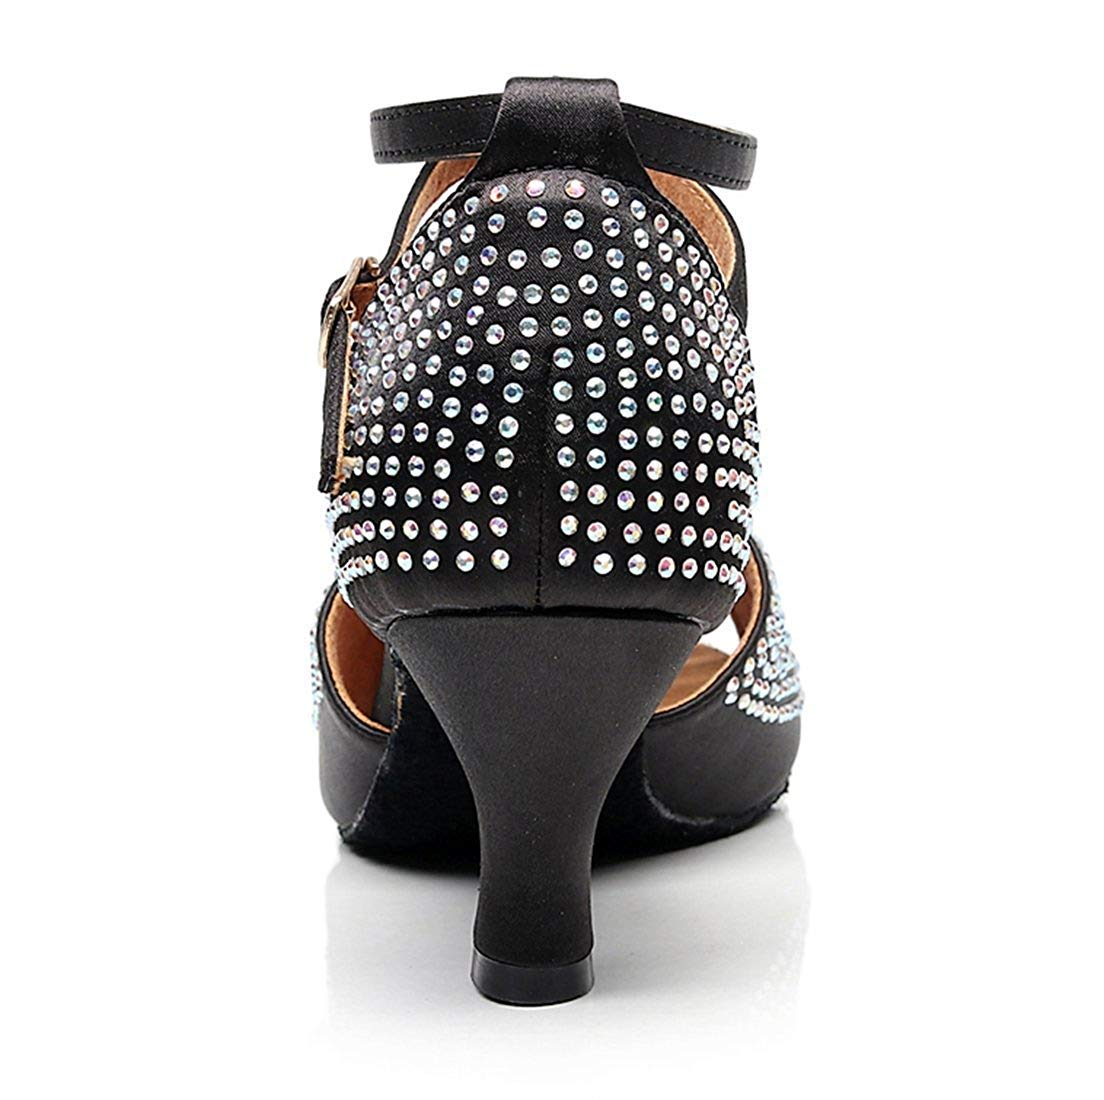 b146dee9db69f0 ... ZHRUI Sparkle Crystalds Cloutés Med Med Med Heel Noir Chaussures De  Danse De Mariage s De ...